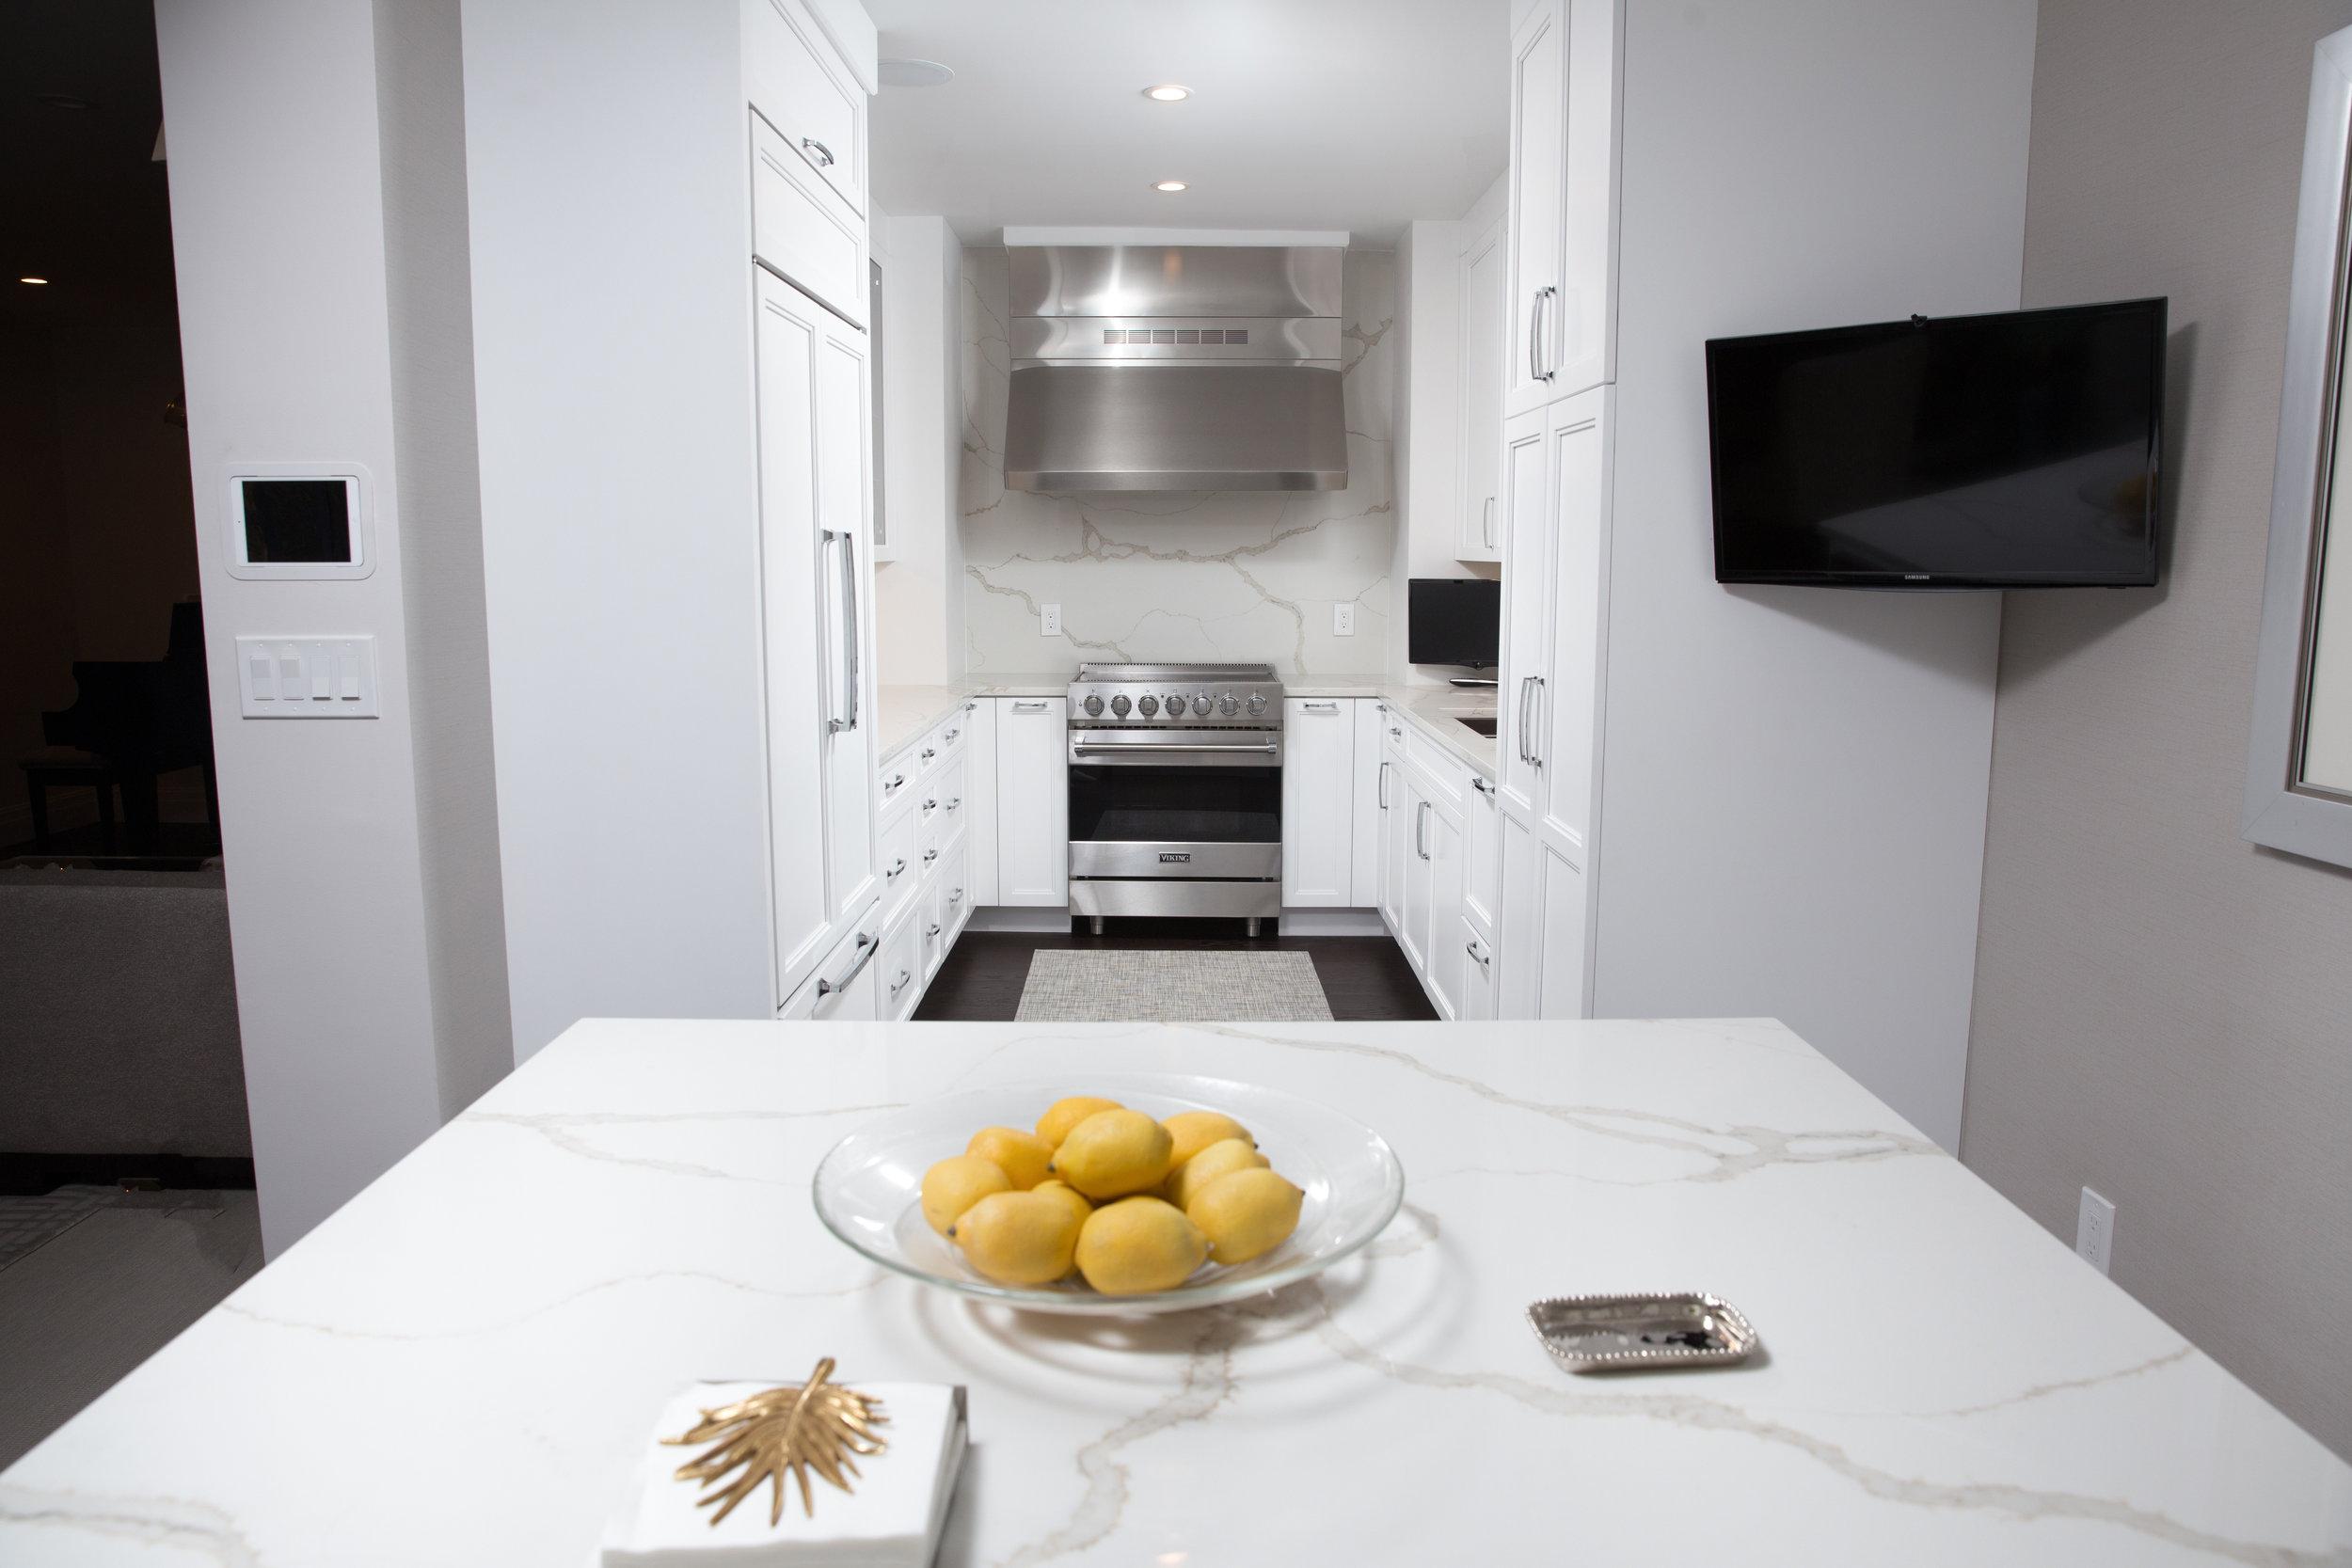 kitchen 2 angle 1.jpg